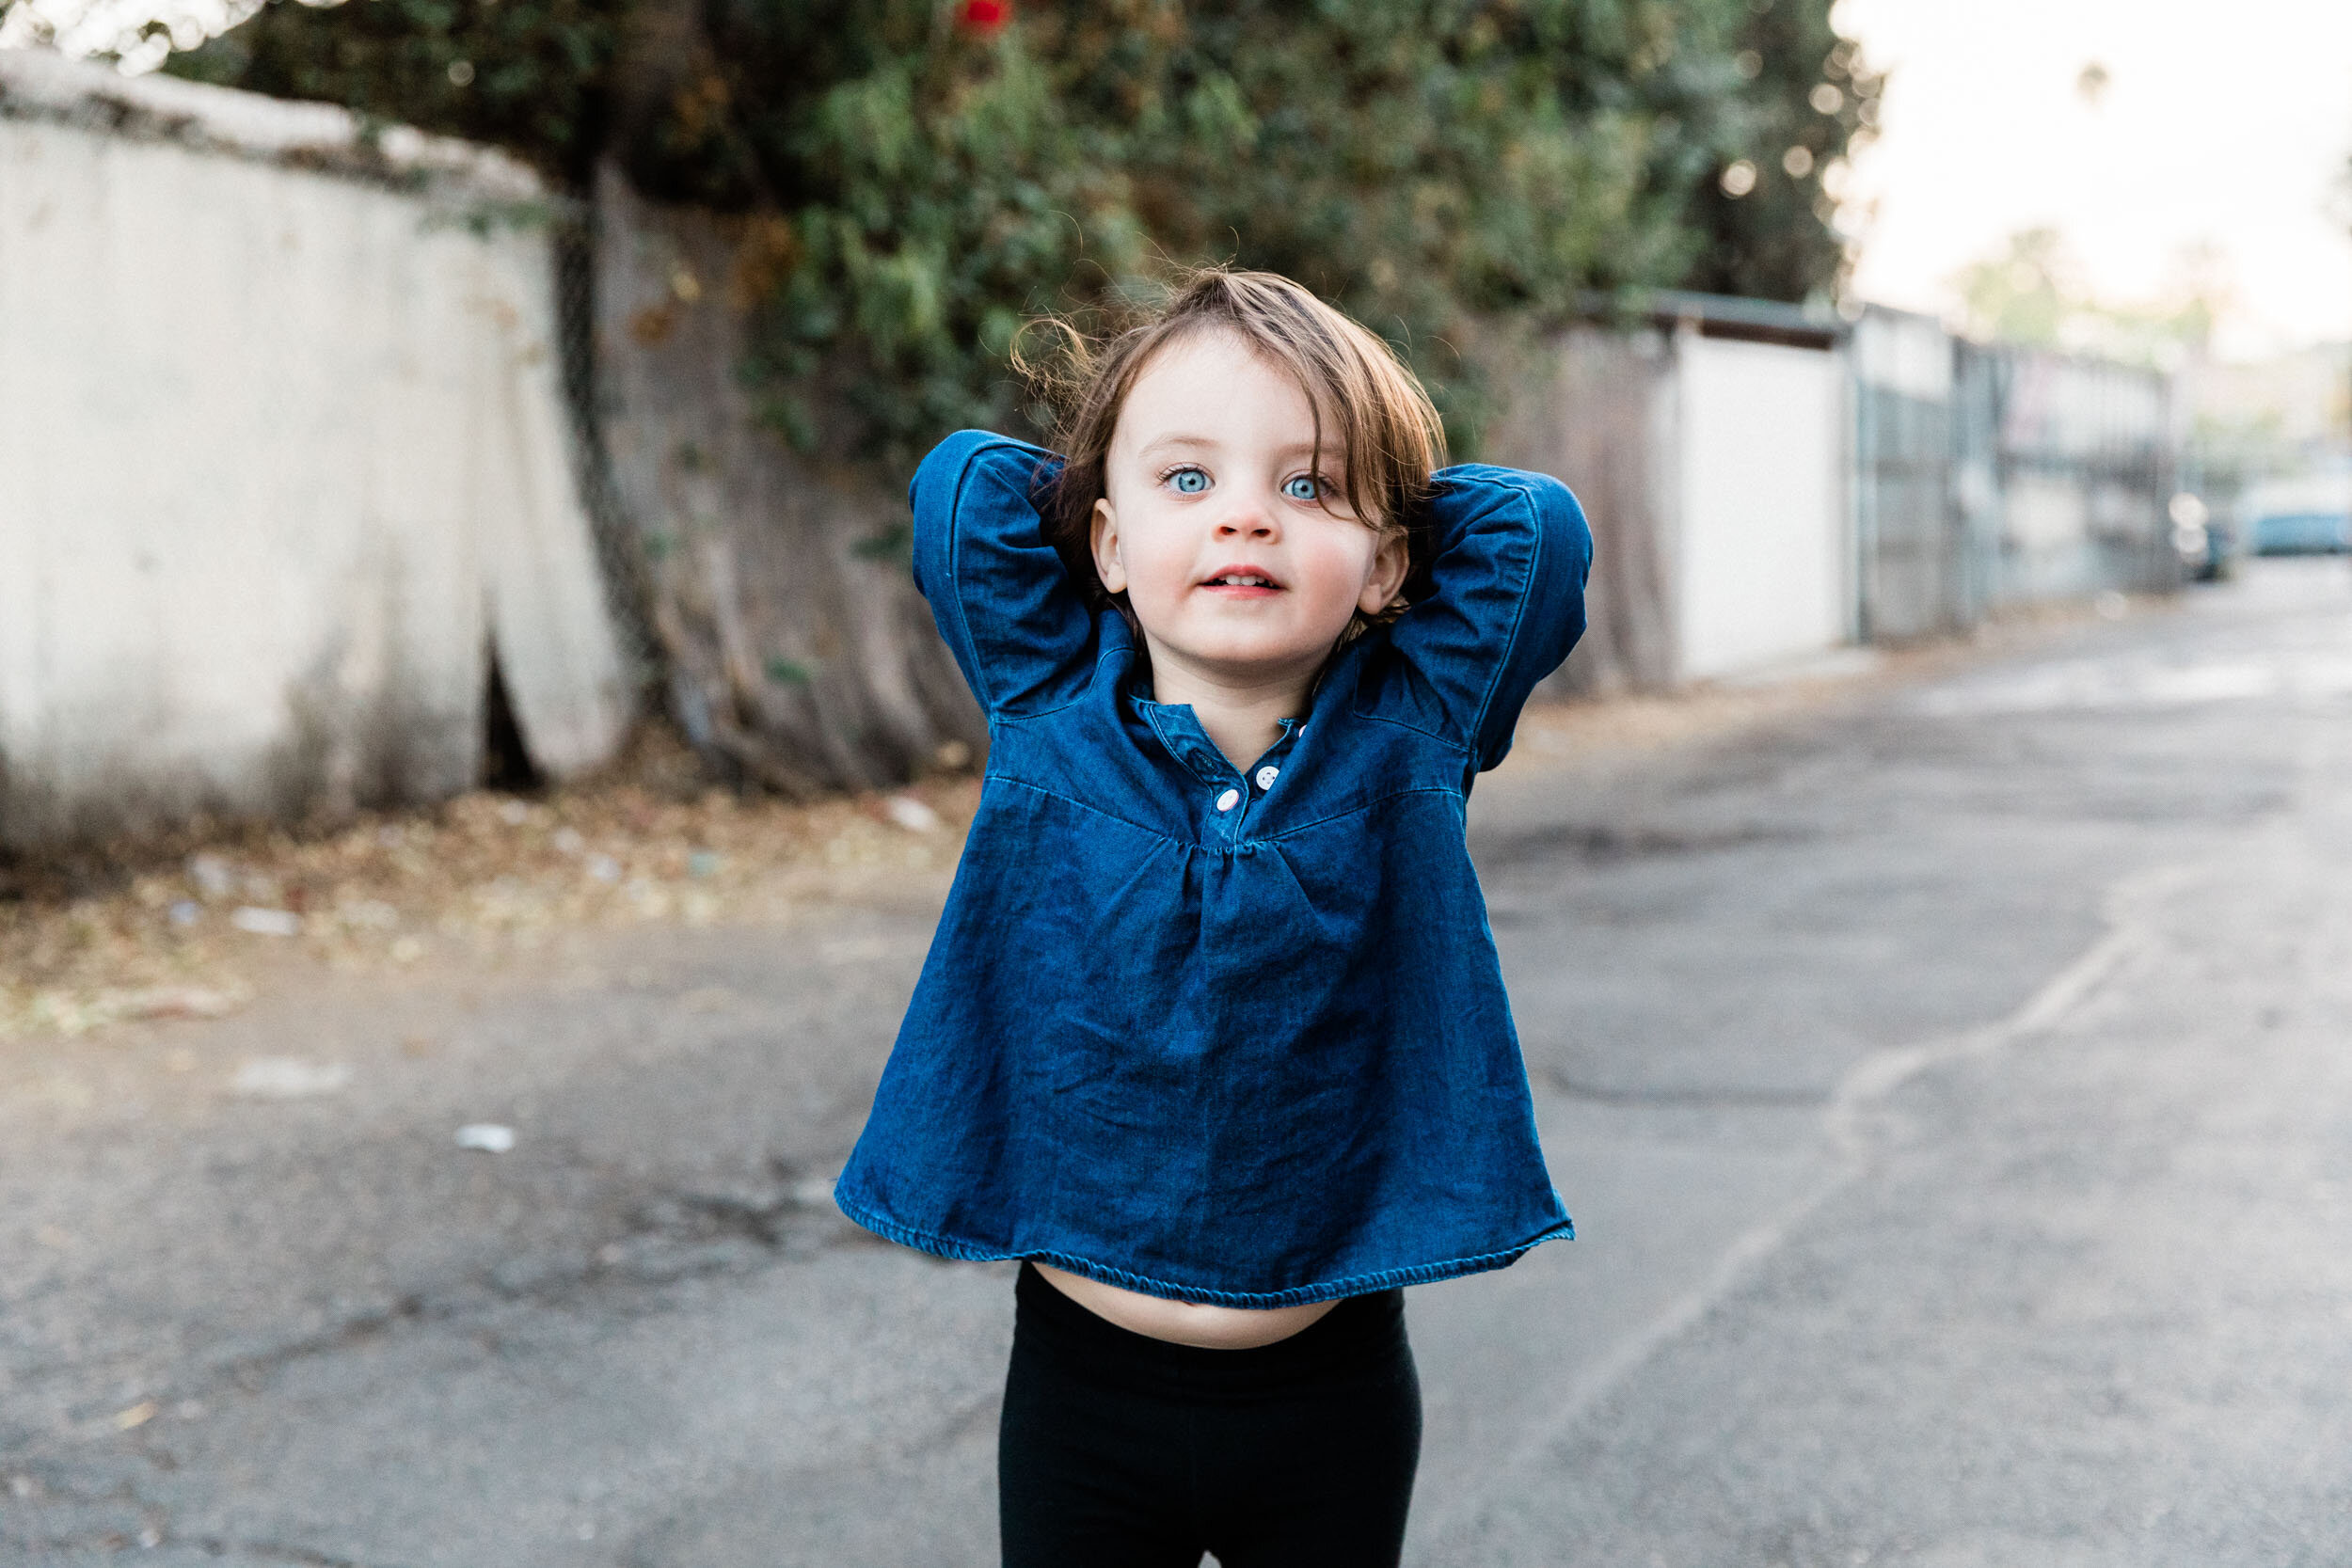 BKM-Photography-Highland-Park-Los-Angeles-Family-Photographer-NELA-Eagle-Rock-Silver-Lake-Glendale-Photographer-0009.jpg